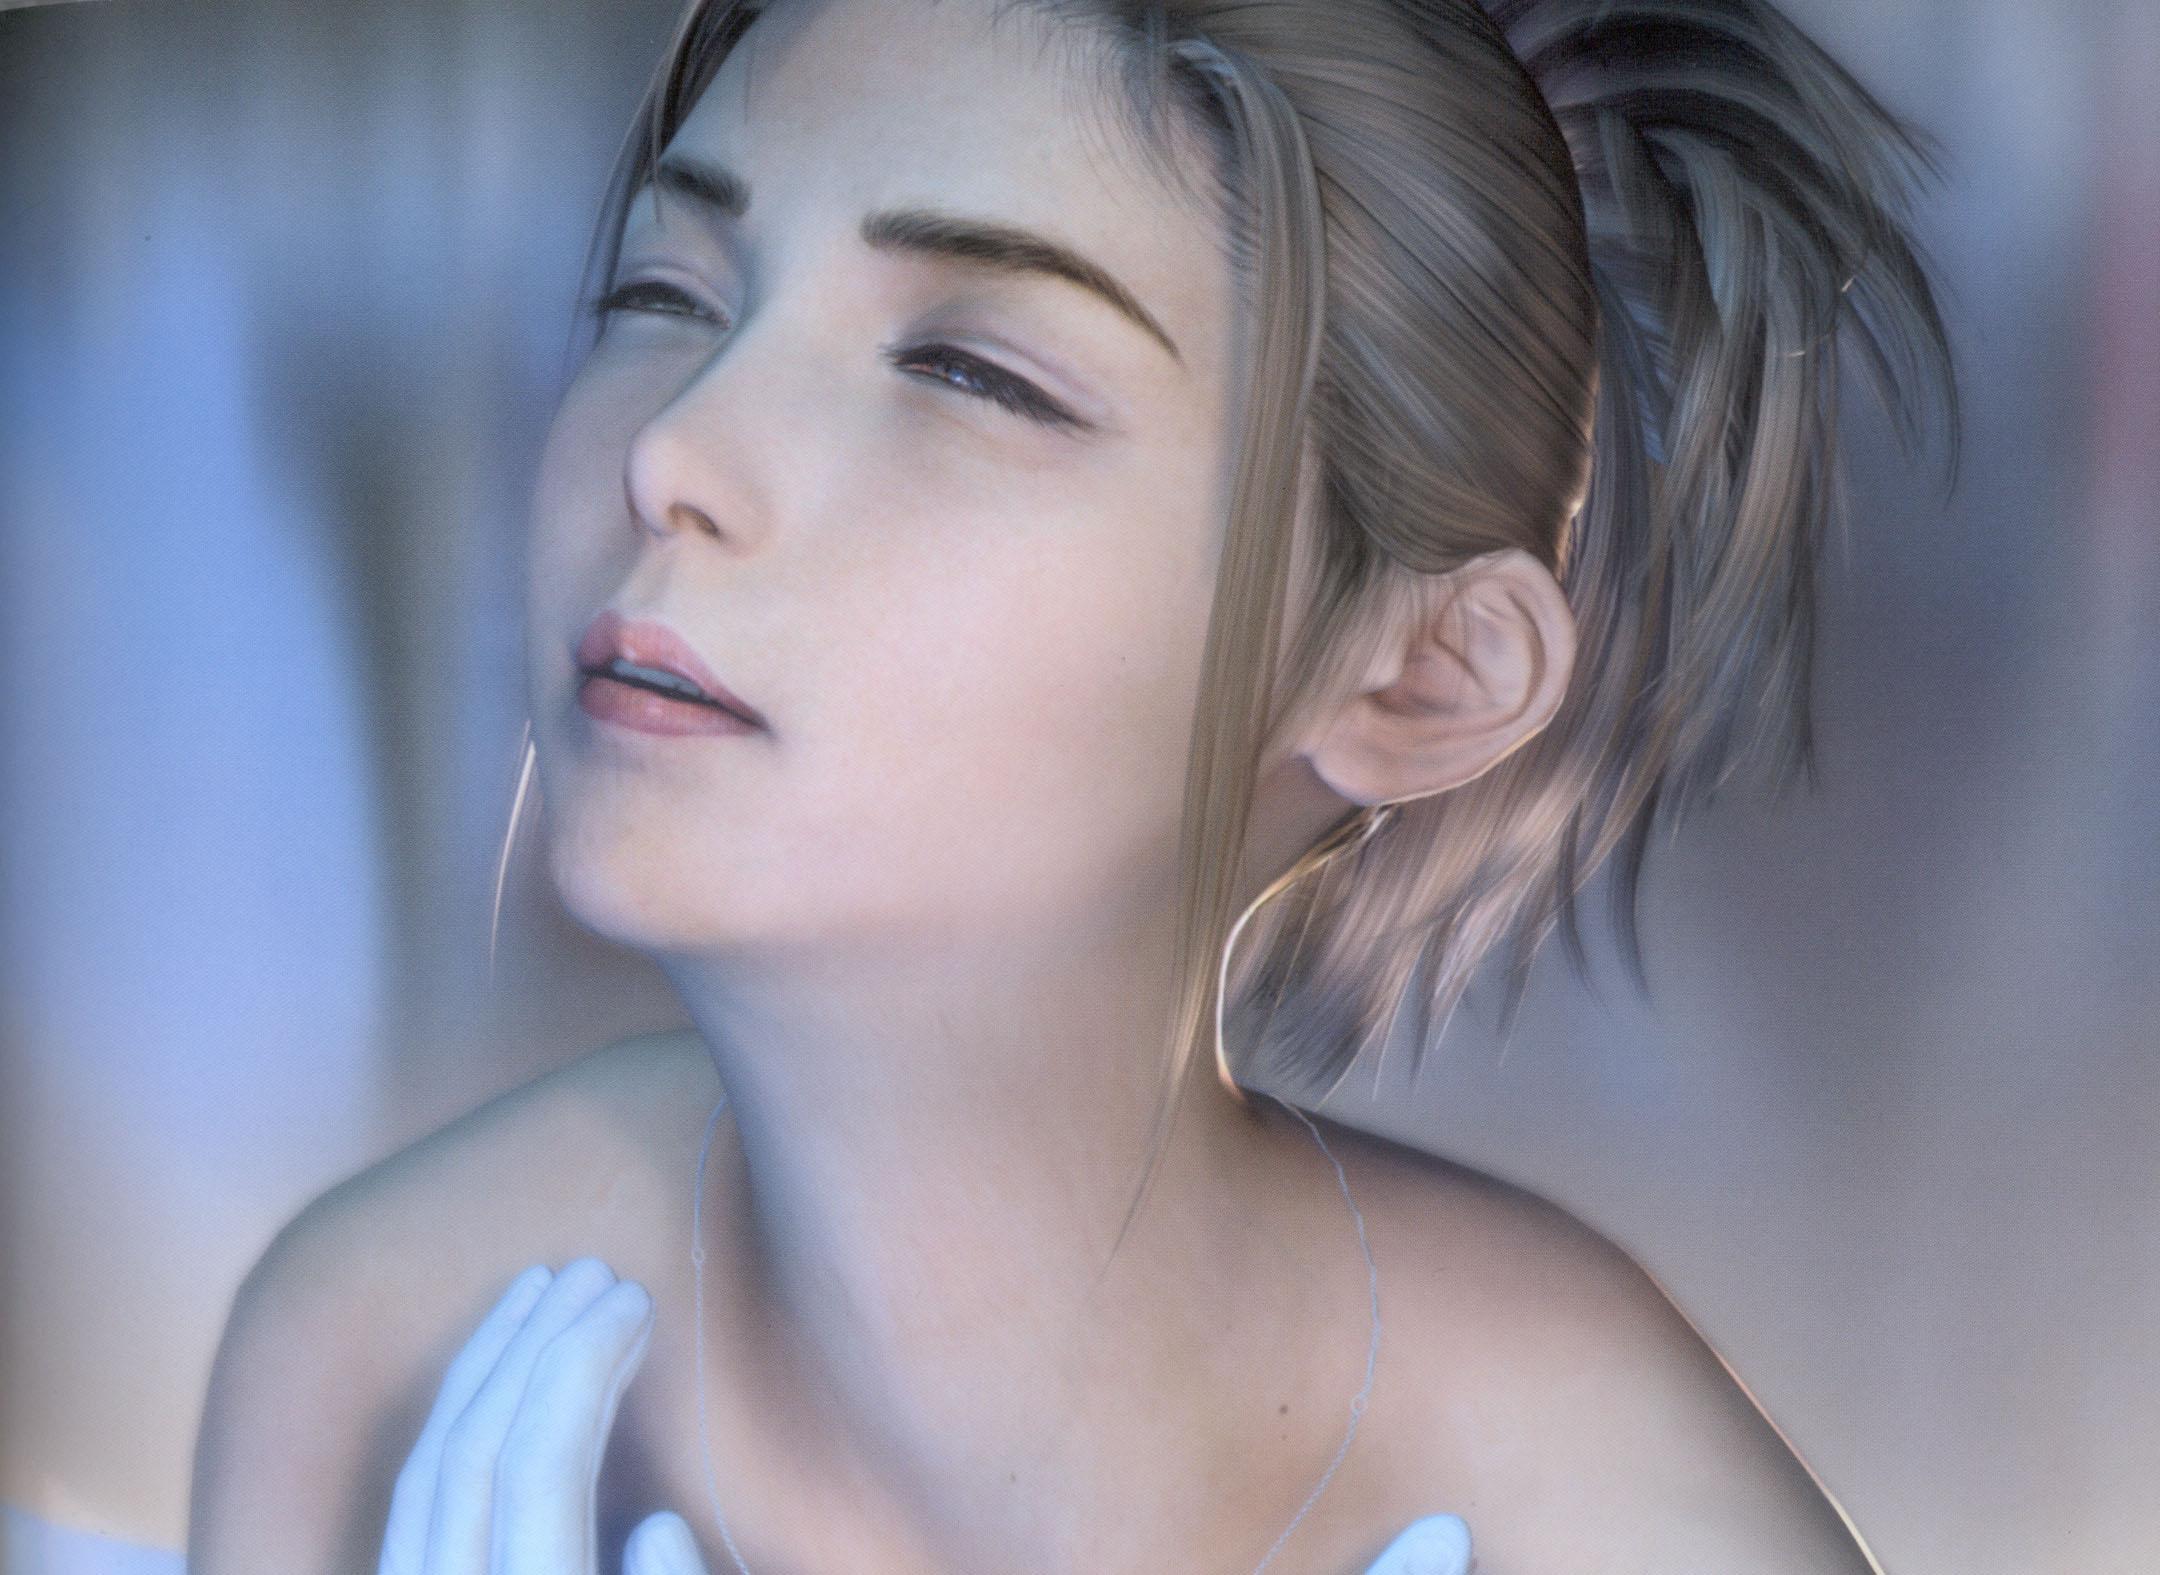 video yuna sex fantasy hentai Final 3d